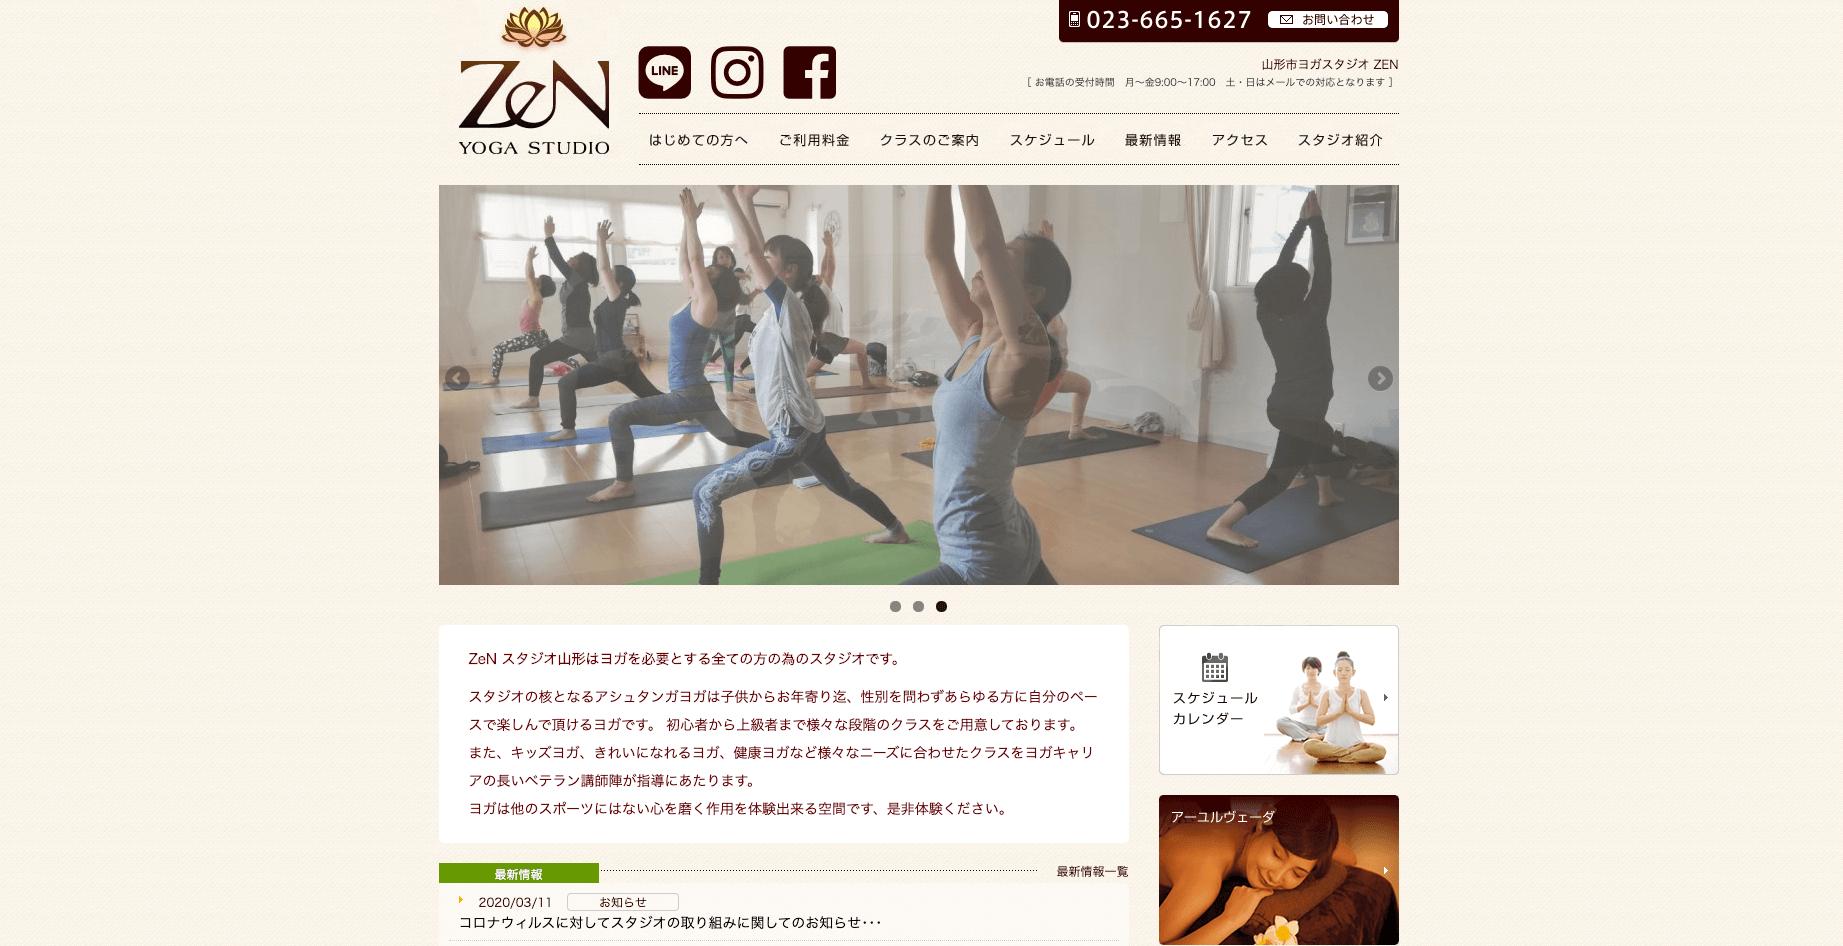 Zen ヨガスタジオ 山形